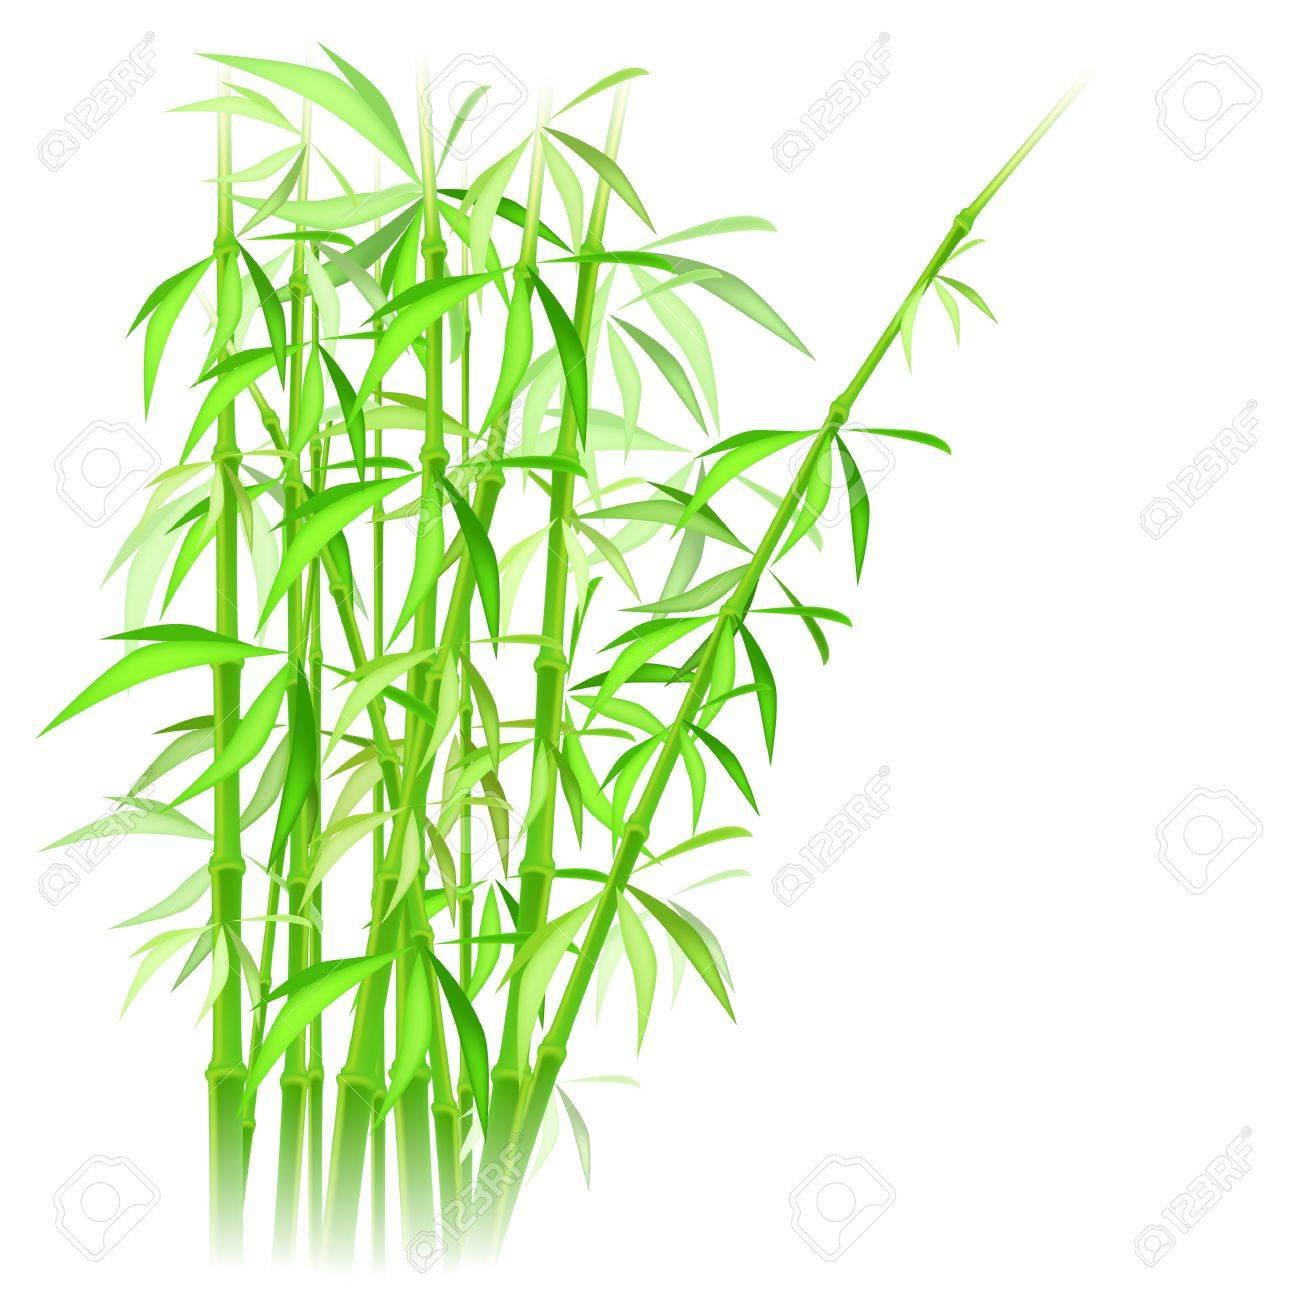 bamboo vector illustration - 11253554